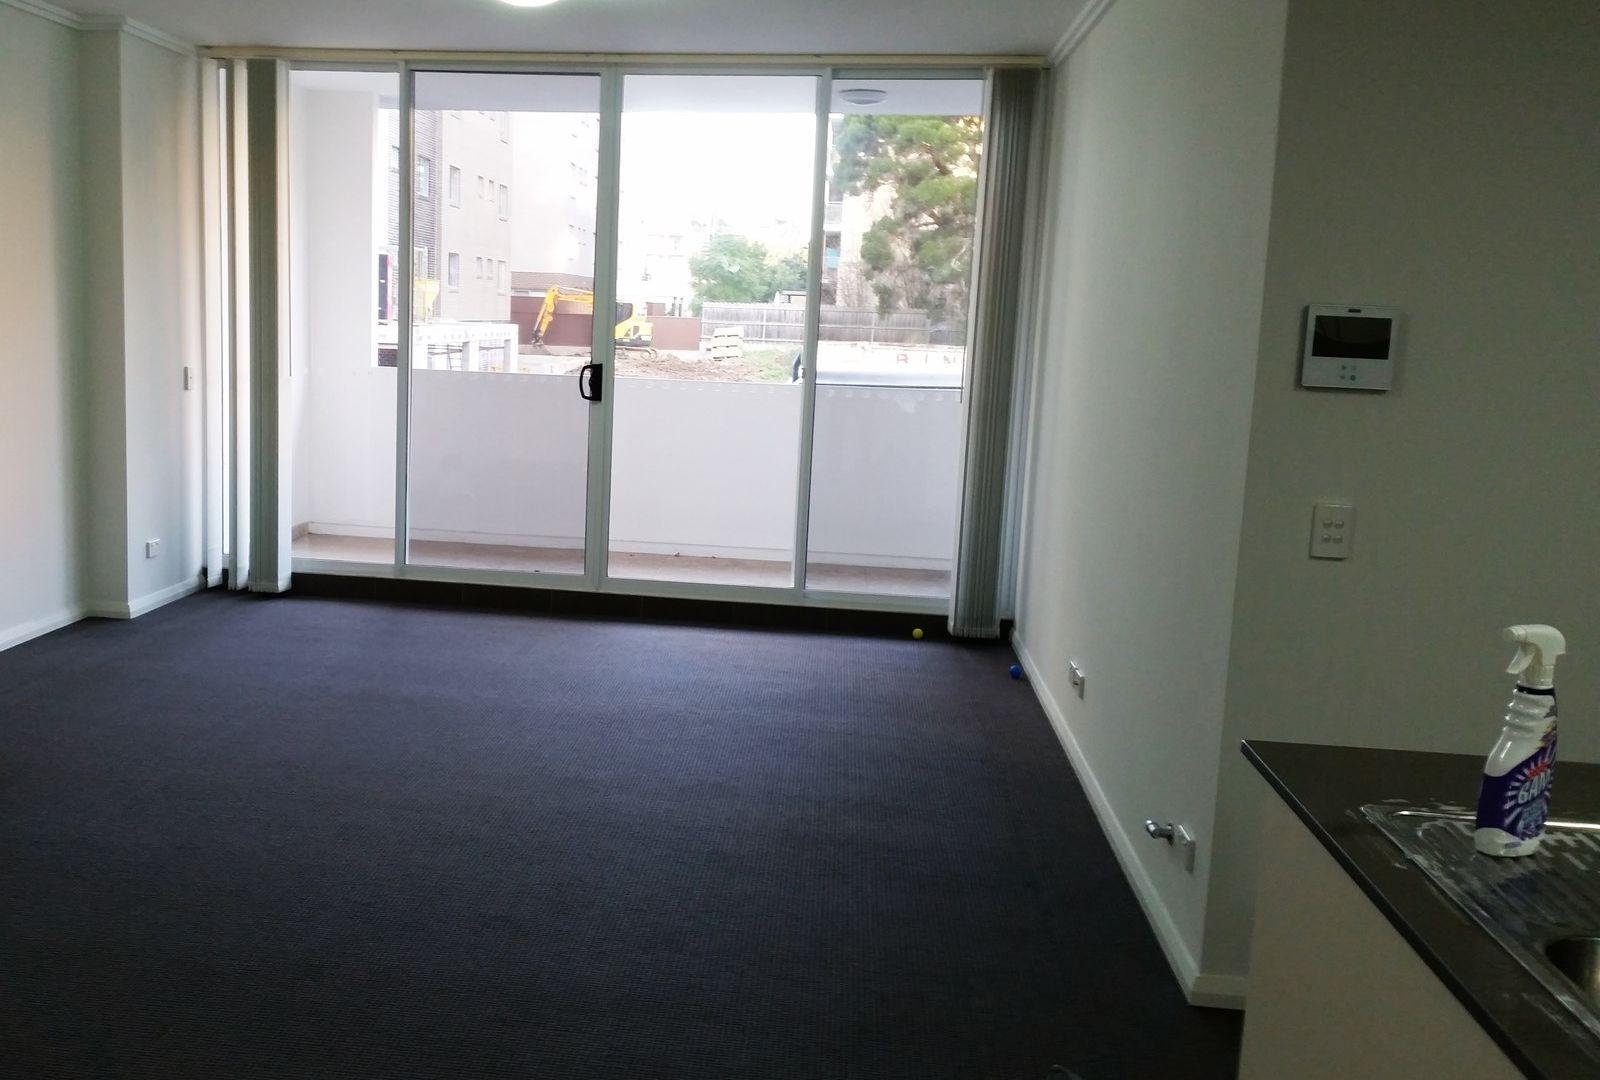 206/1-3 George  Street, Warwick Farm NSW 2170, Image 2